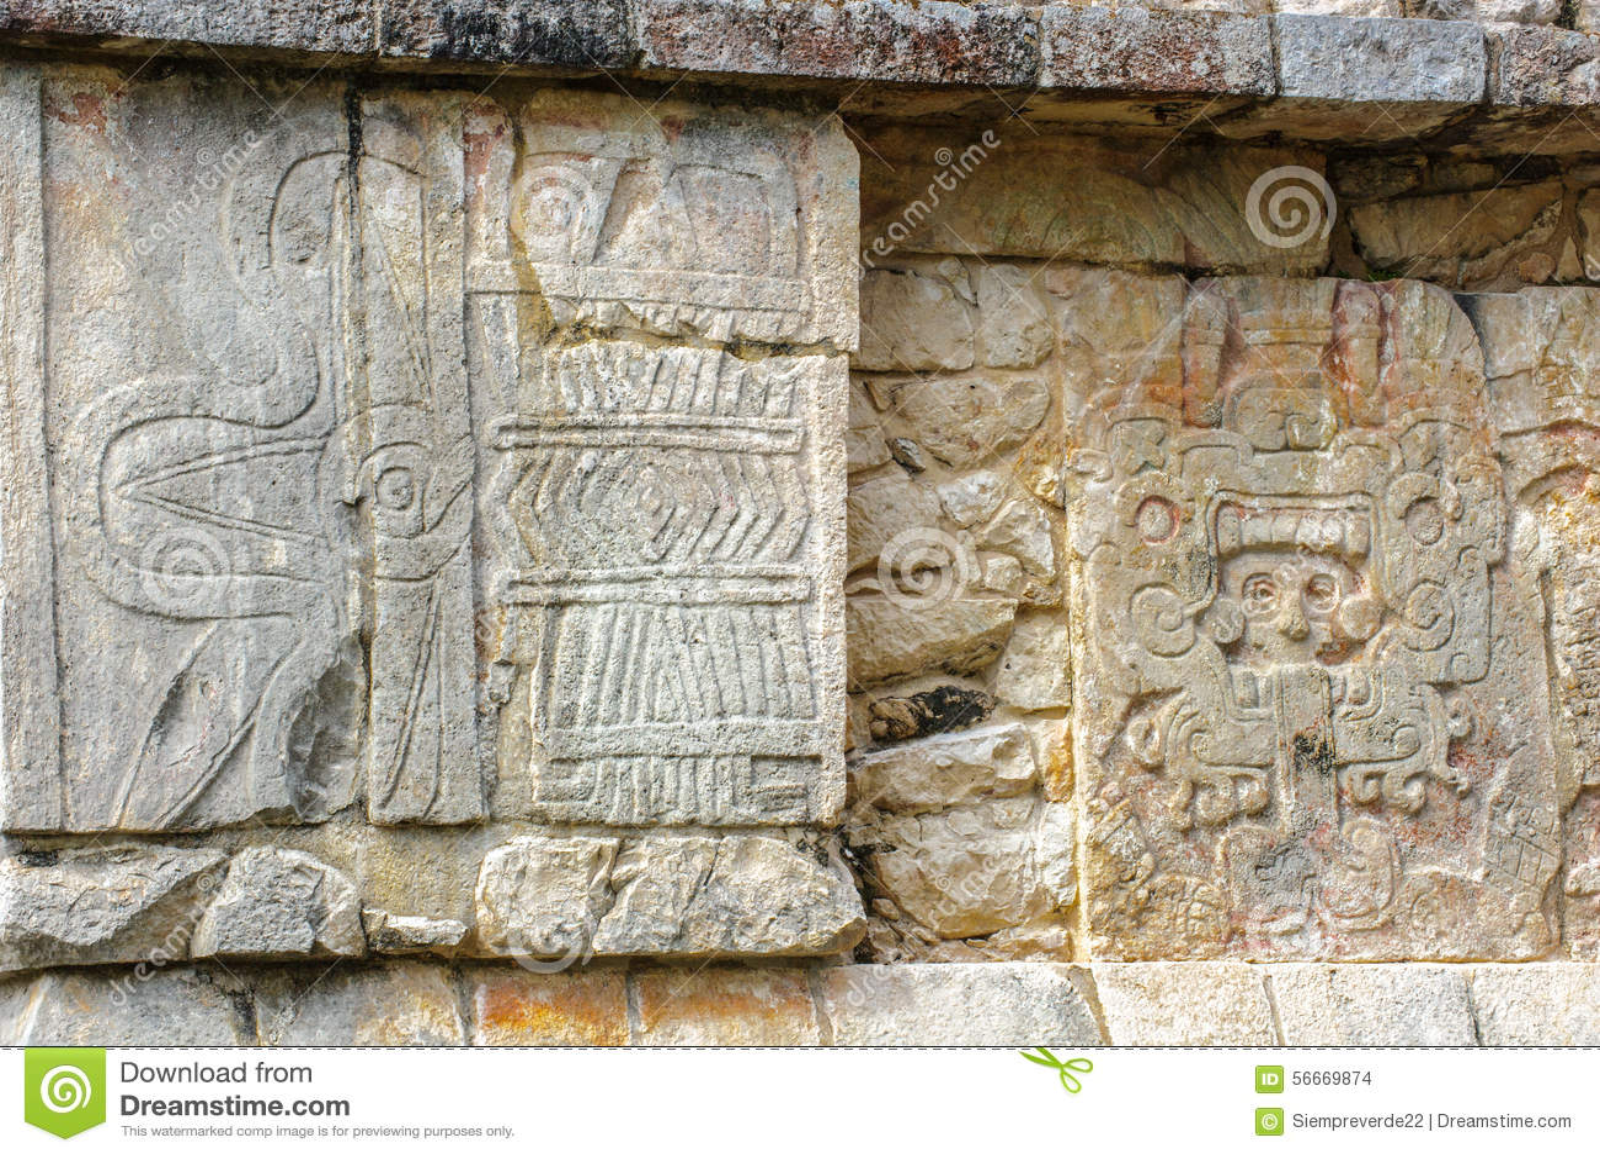 Chichen itza a large pre columbian city built by the maya civil royalty free stock photo buycottarizona